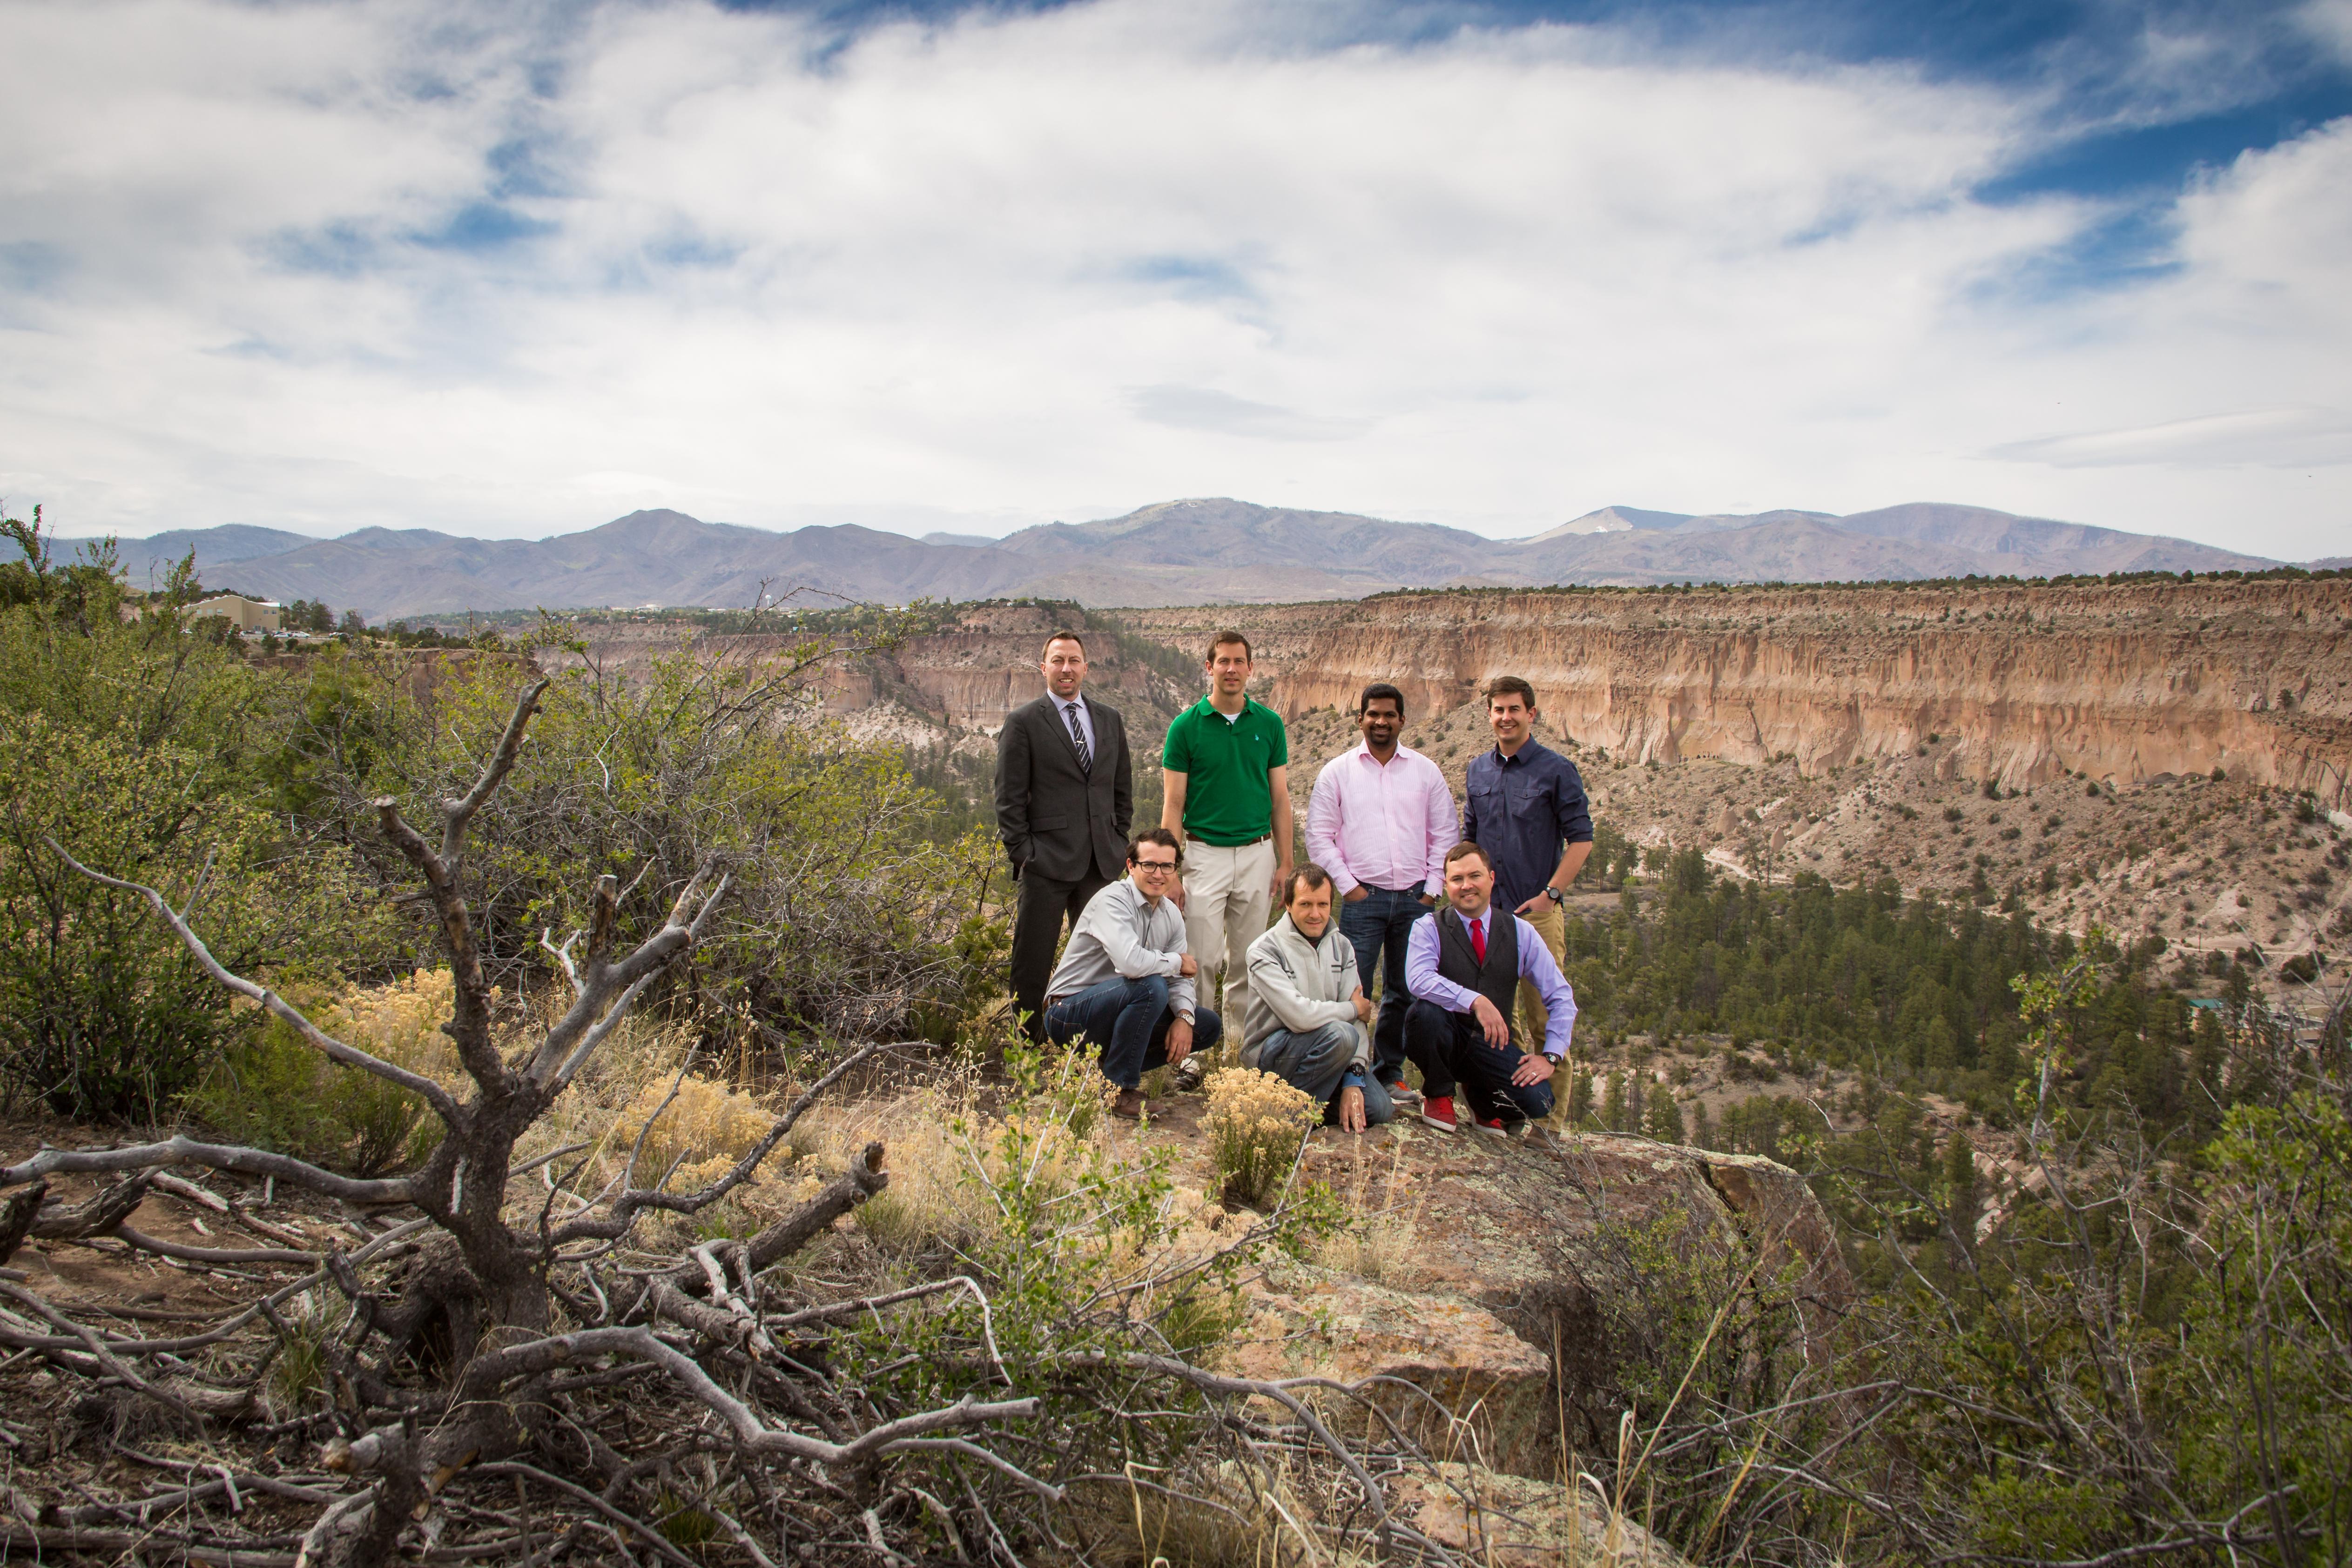 New mexico los alamos county los alamos - Ubiqd Headlines Los Alamos County Economic Development Report